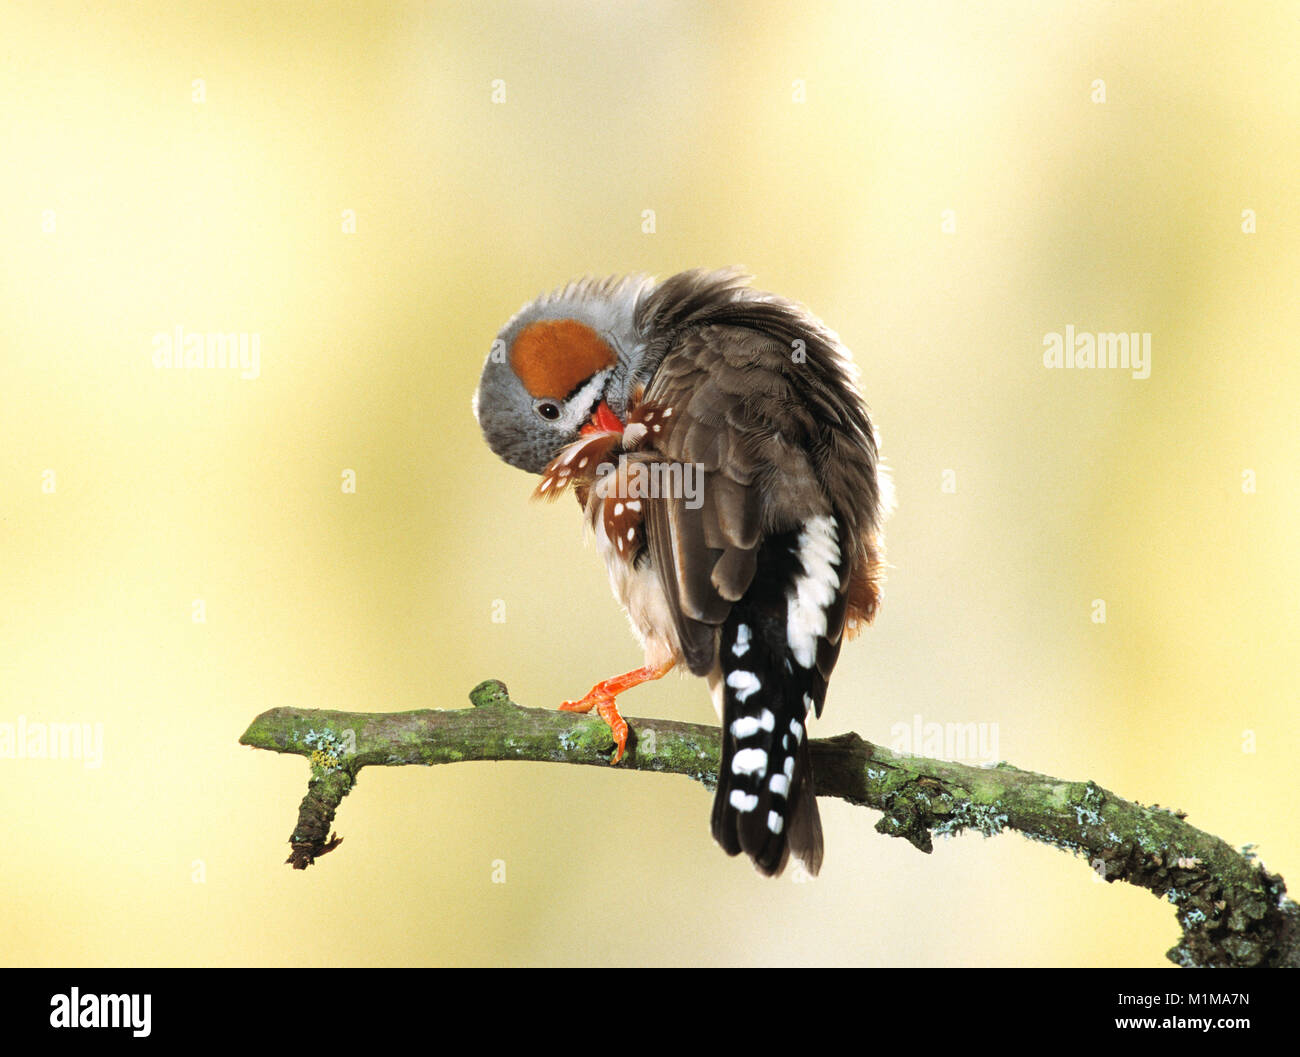 Zebra Finch (Taeniopygia guttata). Adult perched on a twig, preening. Germany - Stock Image